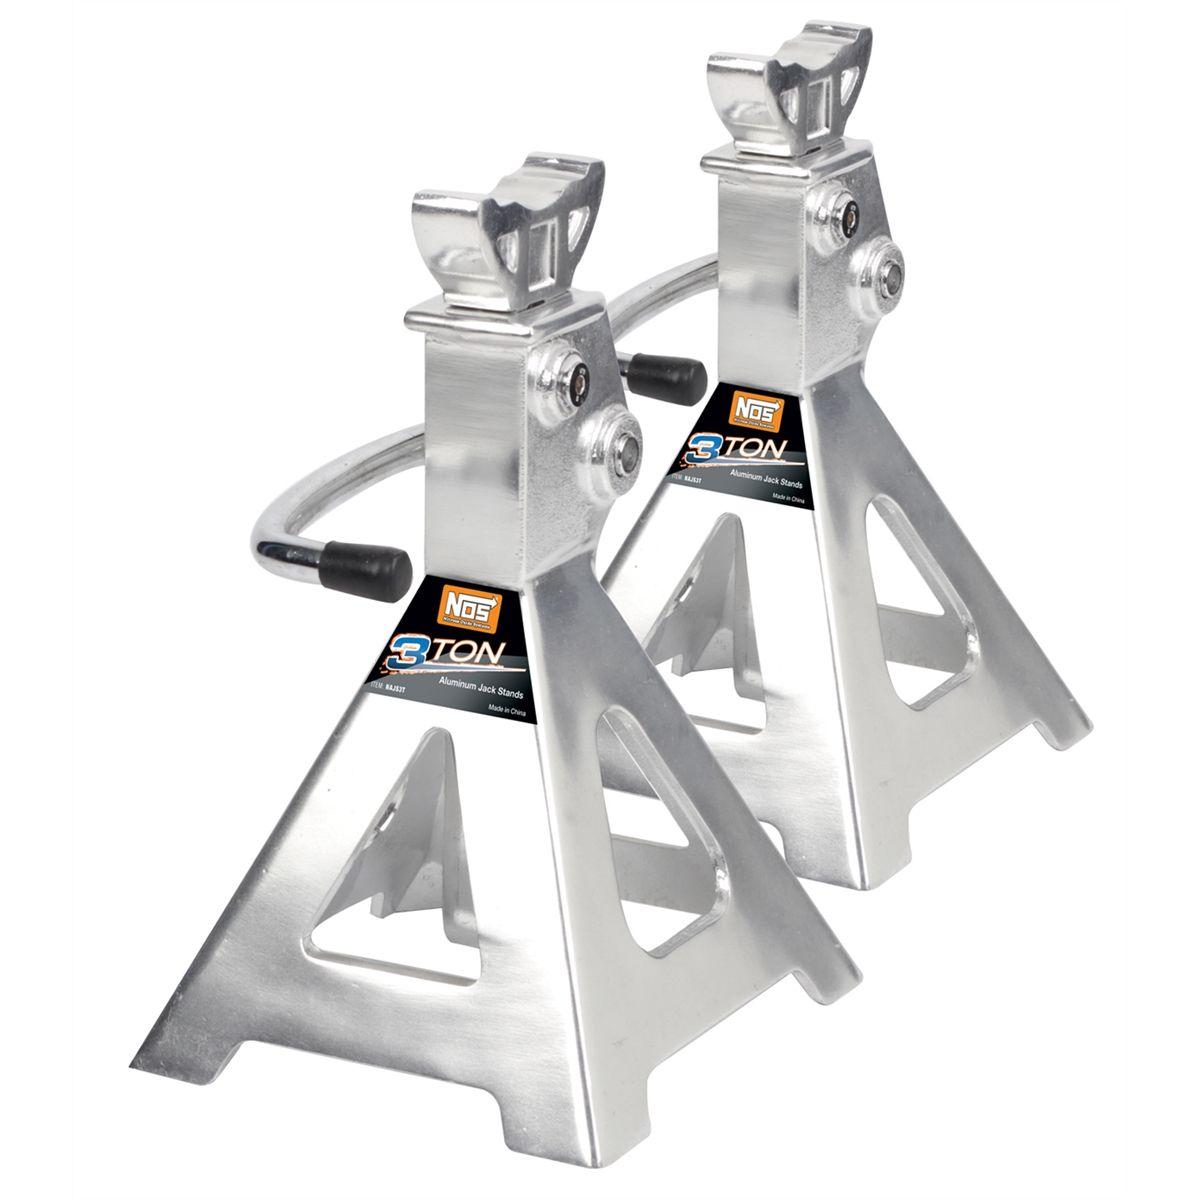 3 Ton Aluminum Jack Stand Ratchet Style Najs3t